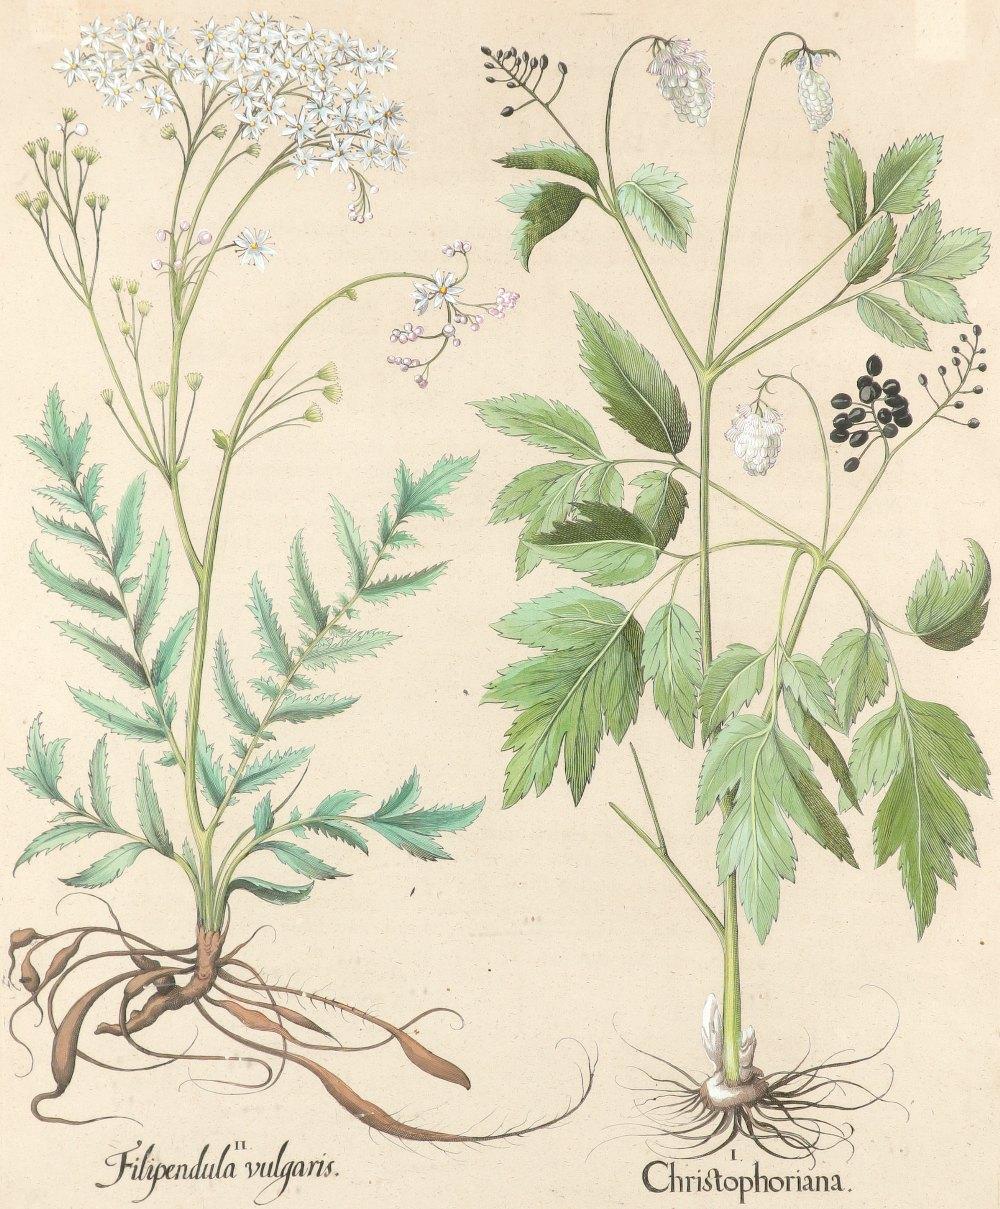 After Basilius Besler Poma flore multiplici; Aquilegia stellata flore vio laceo; Cytisus - Image 34 of 36